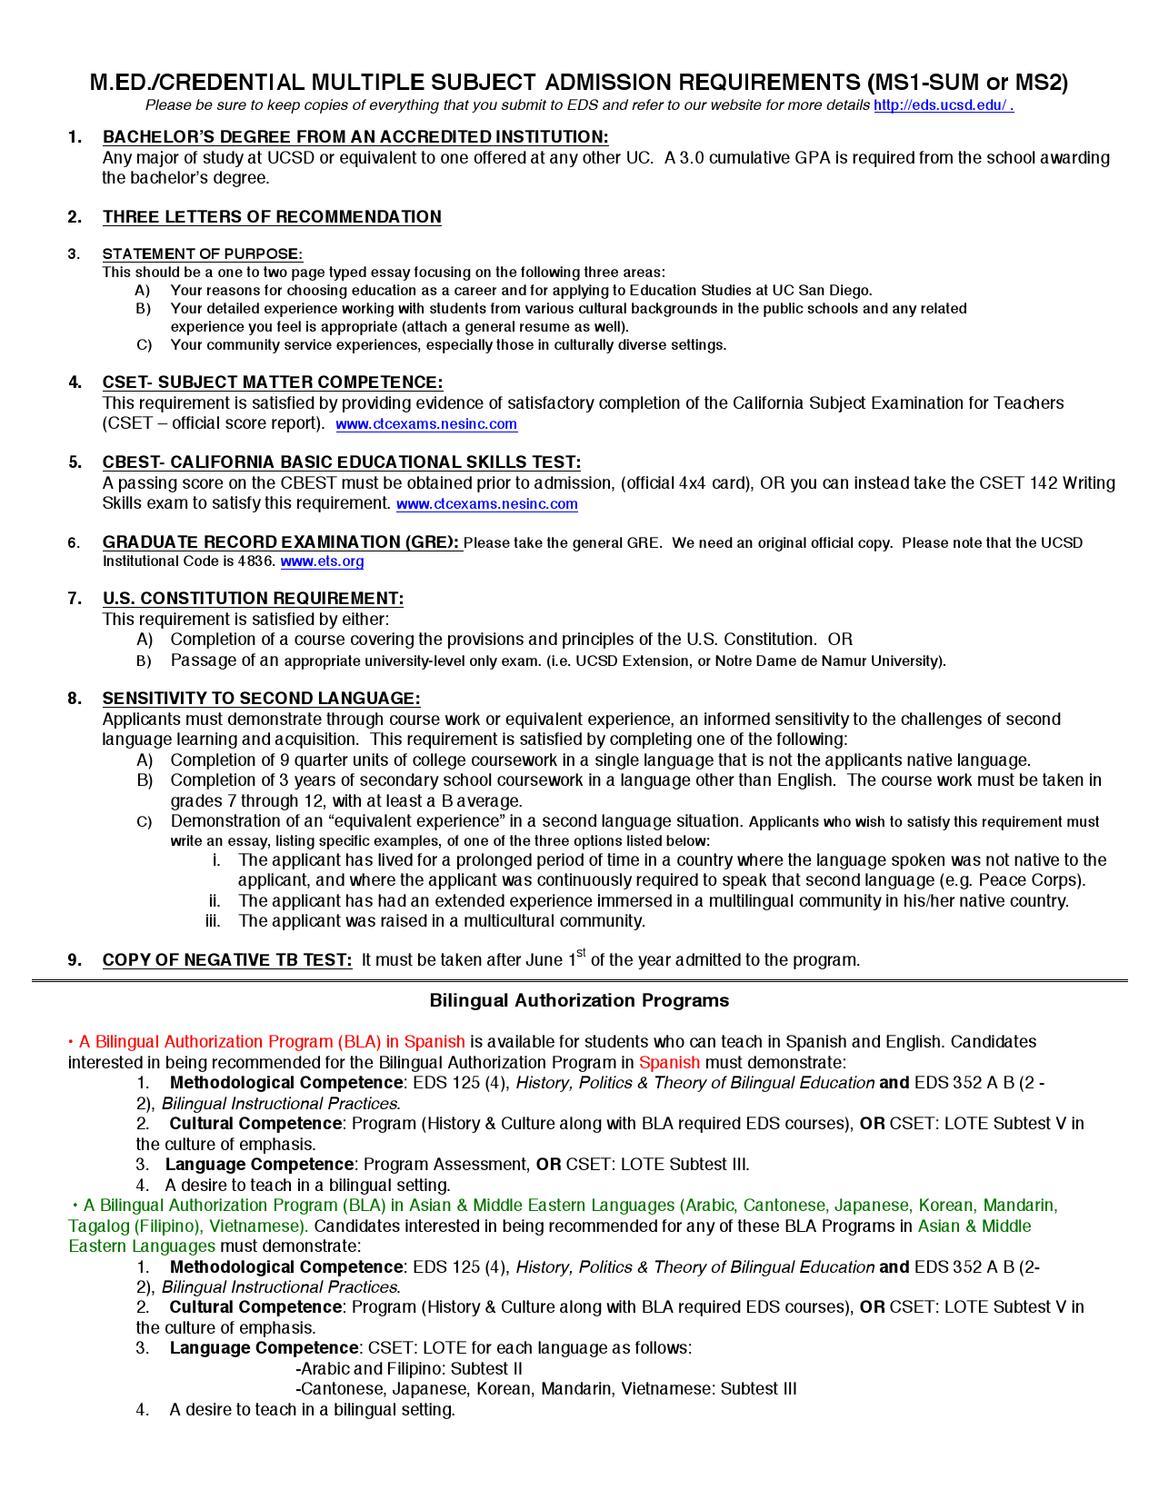 Multiple Subject Brochure by melissa wolf - issuu